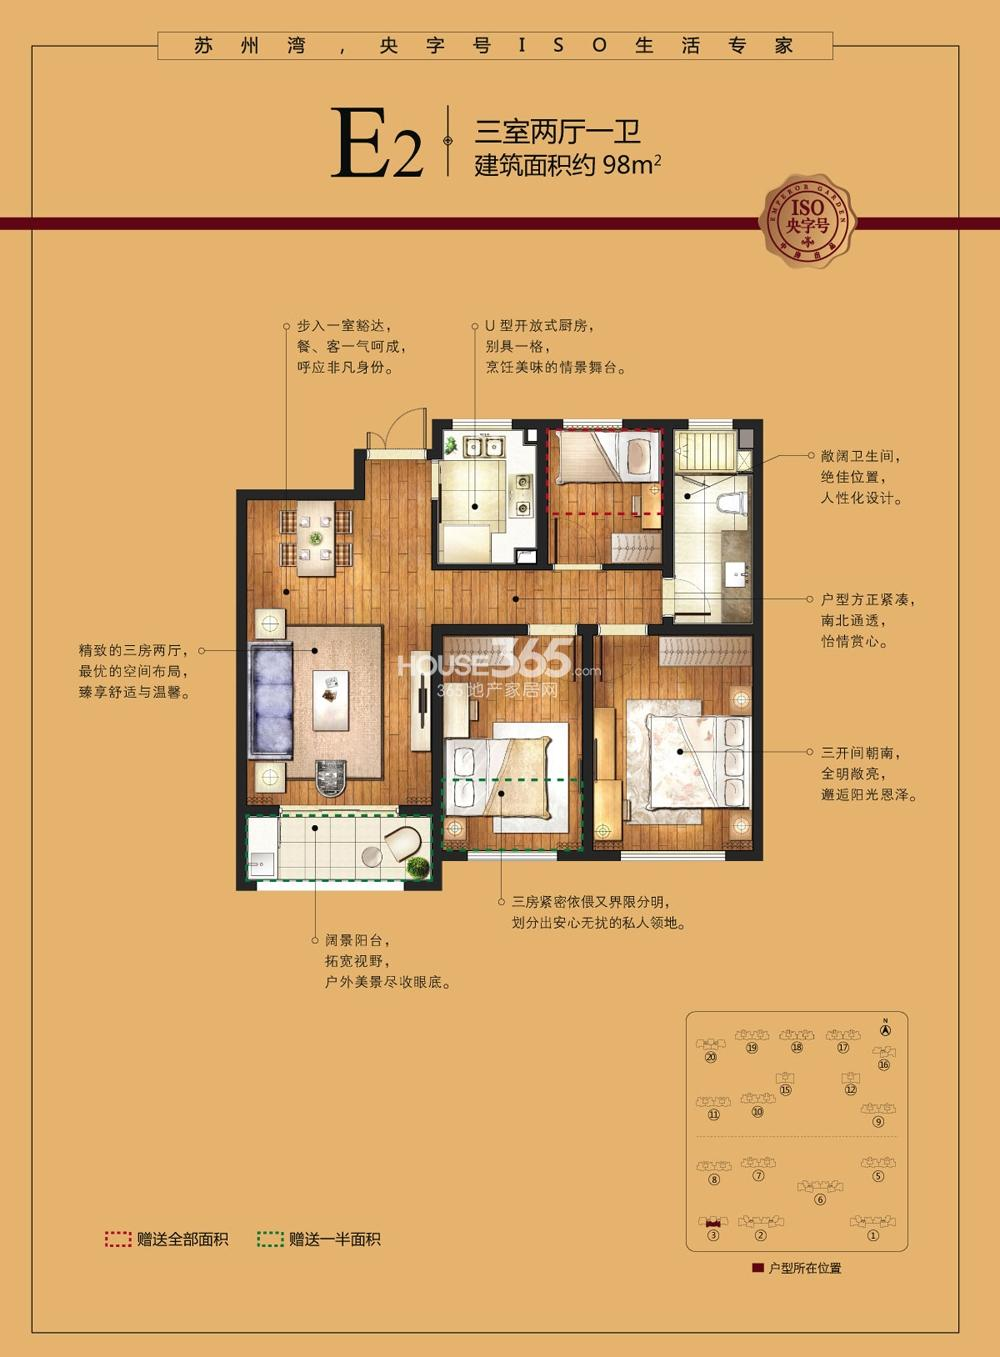 E2户型98平米,三室两厅一卫